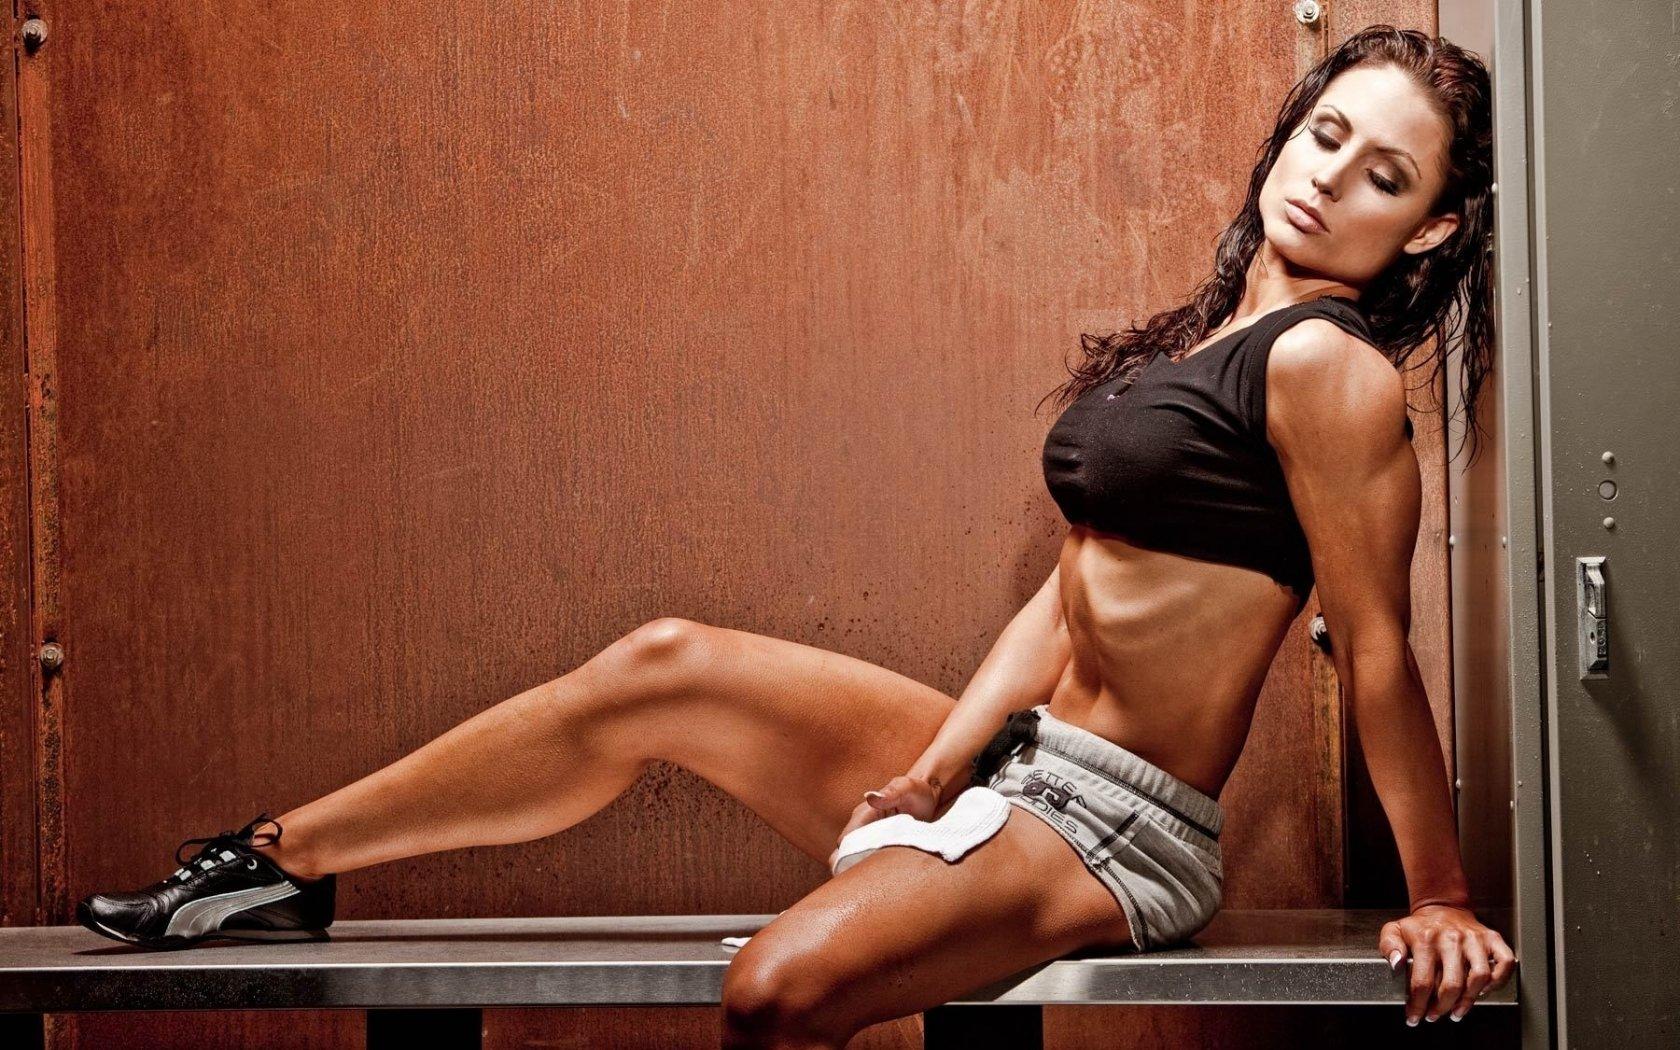 Police Officer Girl Wallpaper Sports Girl Fitness Models Gym Muscle Wallpaper